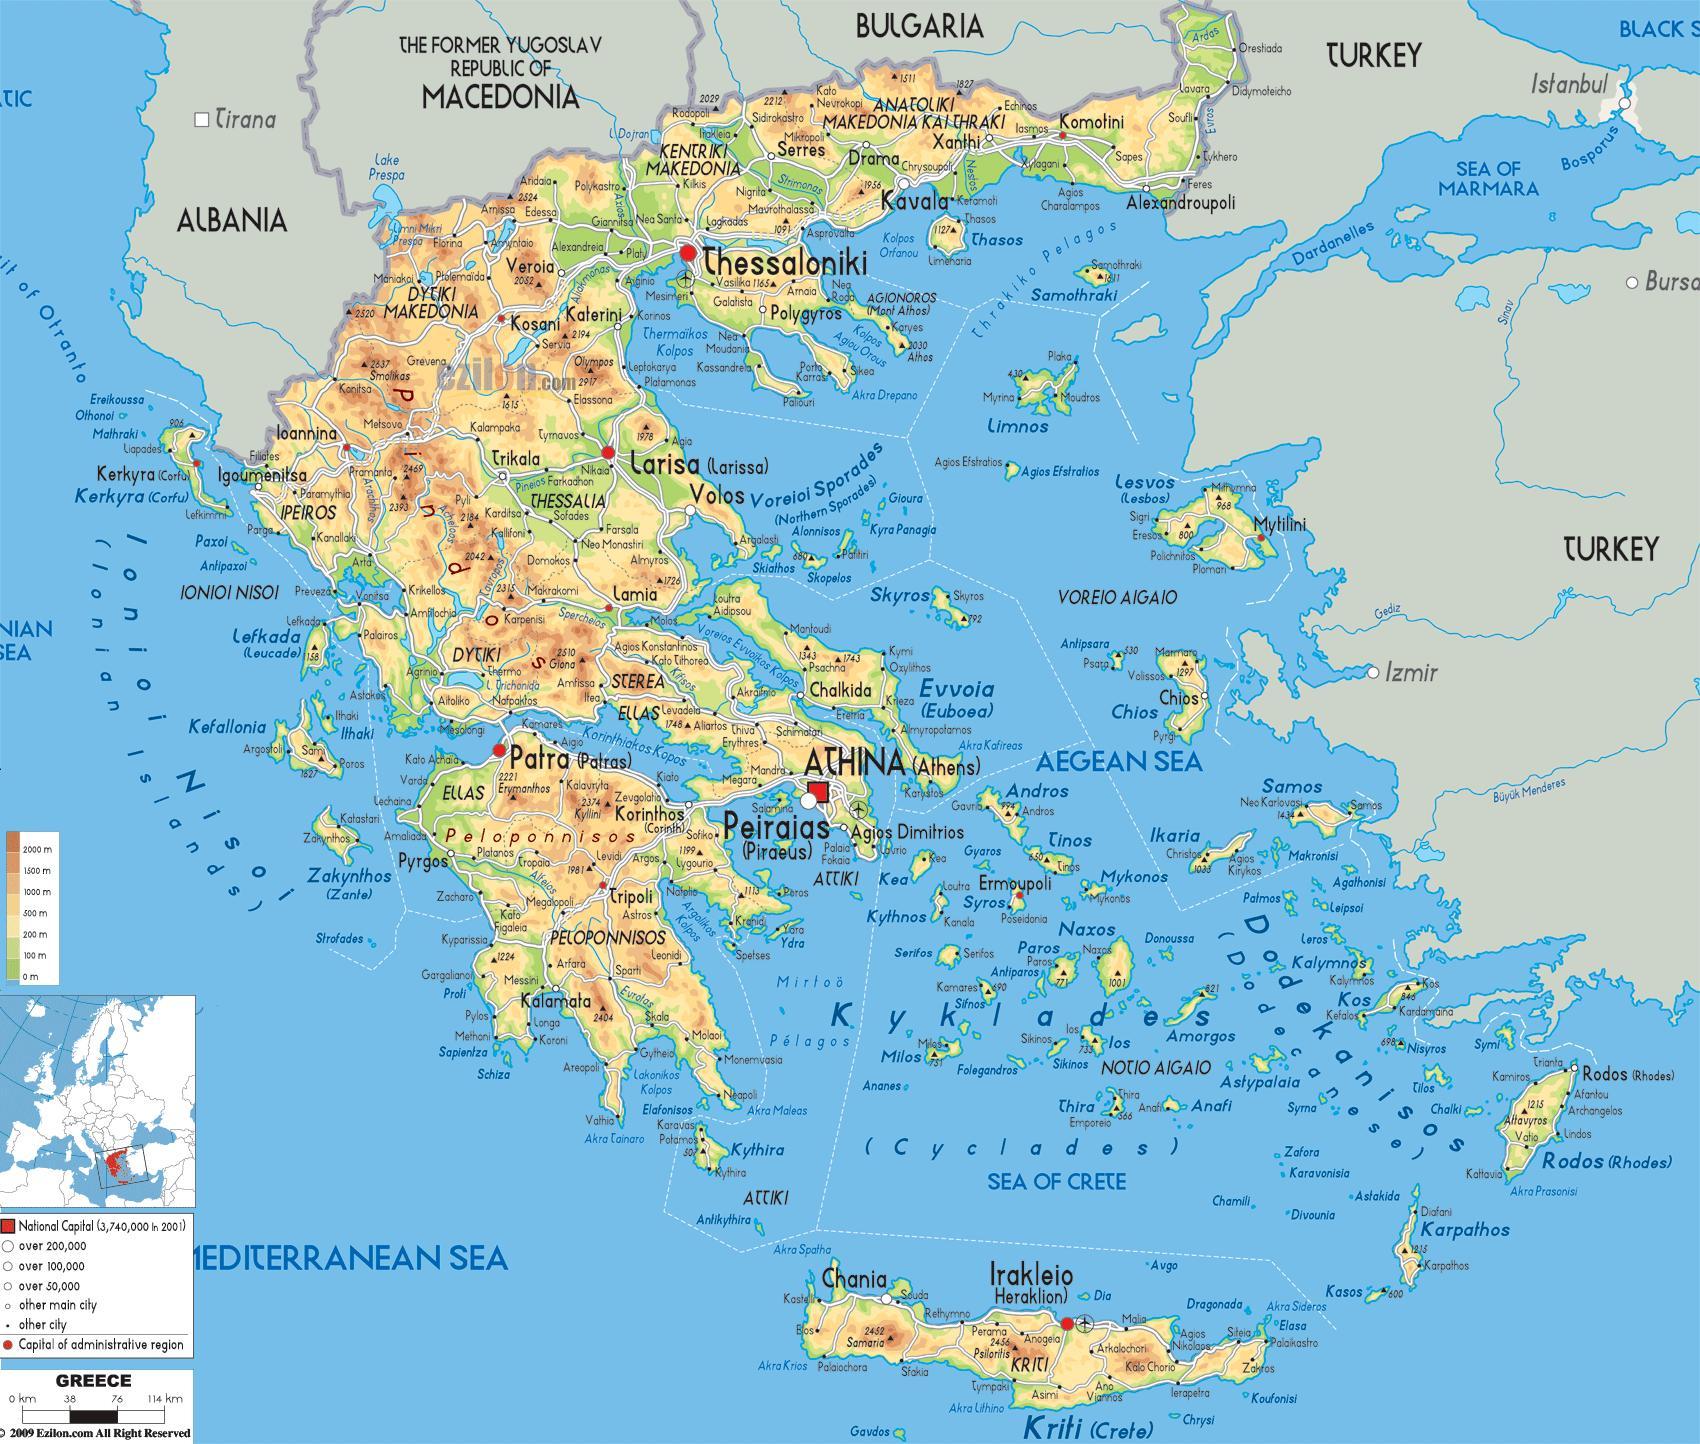 geografska mapa grcke Grčka geografija kartica   Geografska karta Grčke (Južna Europa  geografska mapa grcke